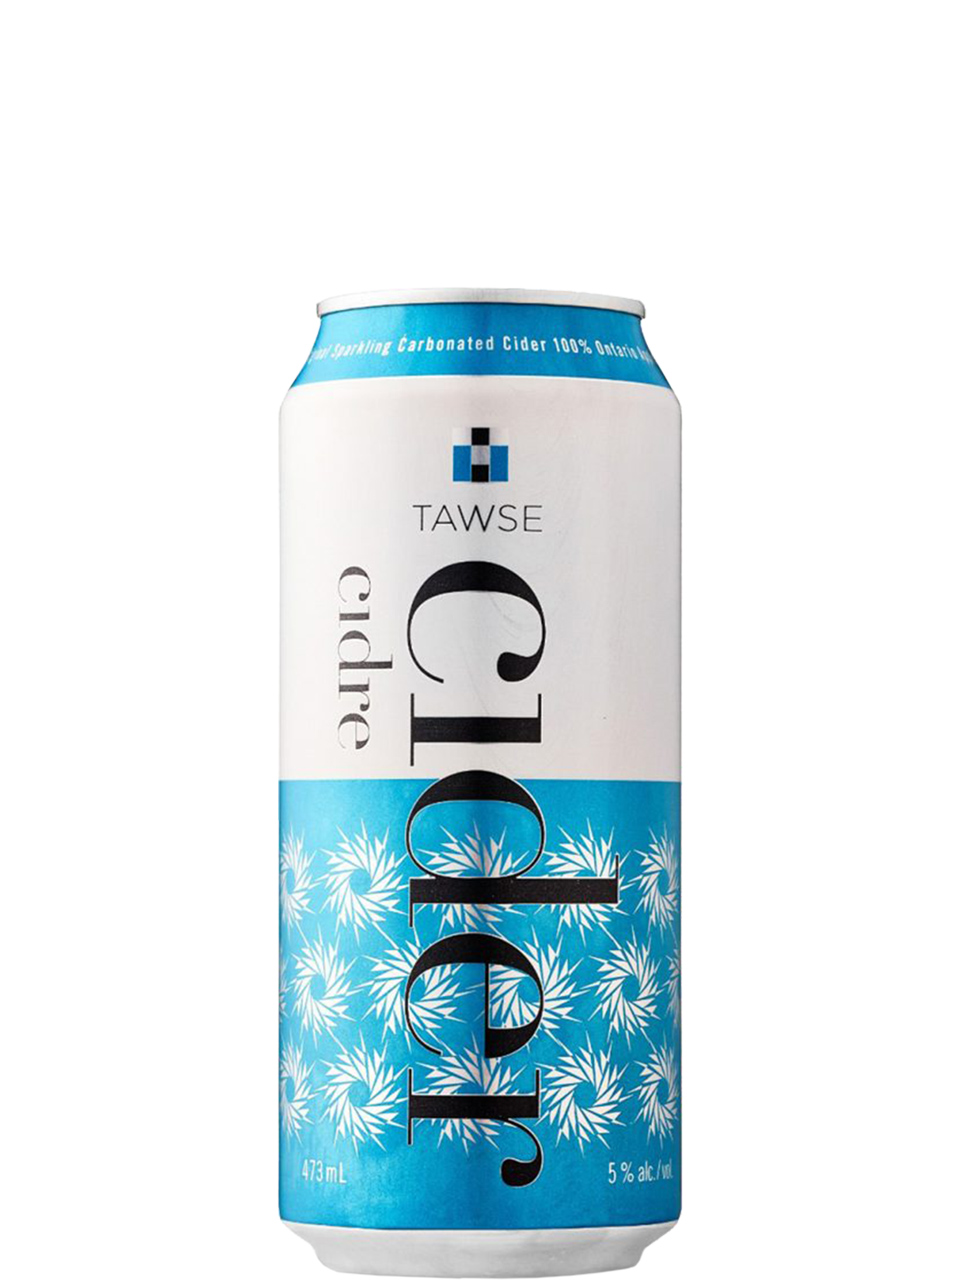 Tawse Cider 473ml Can